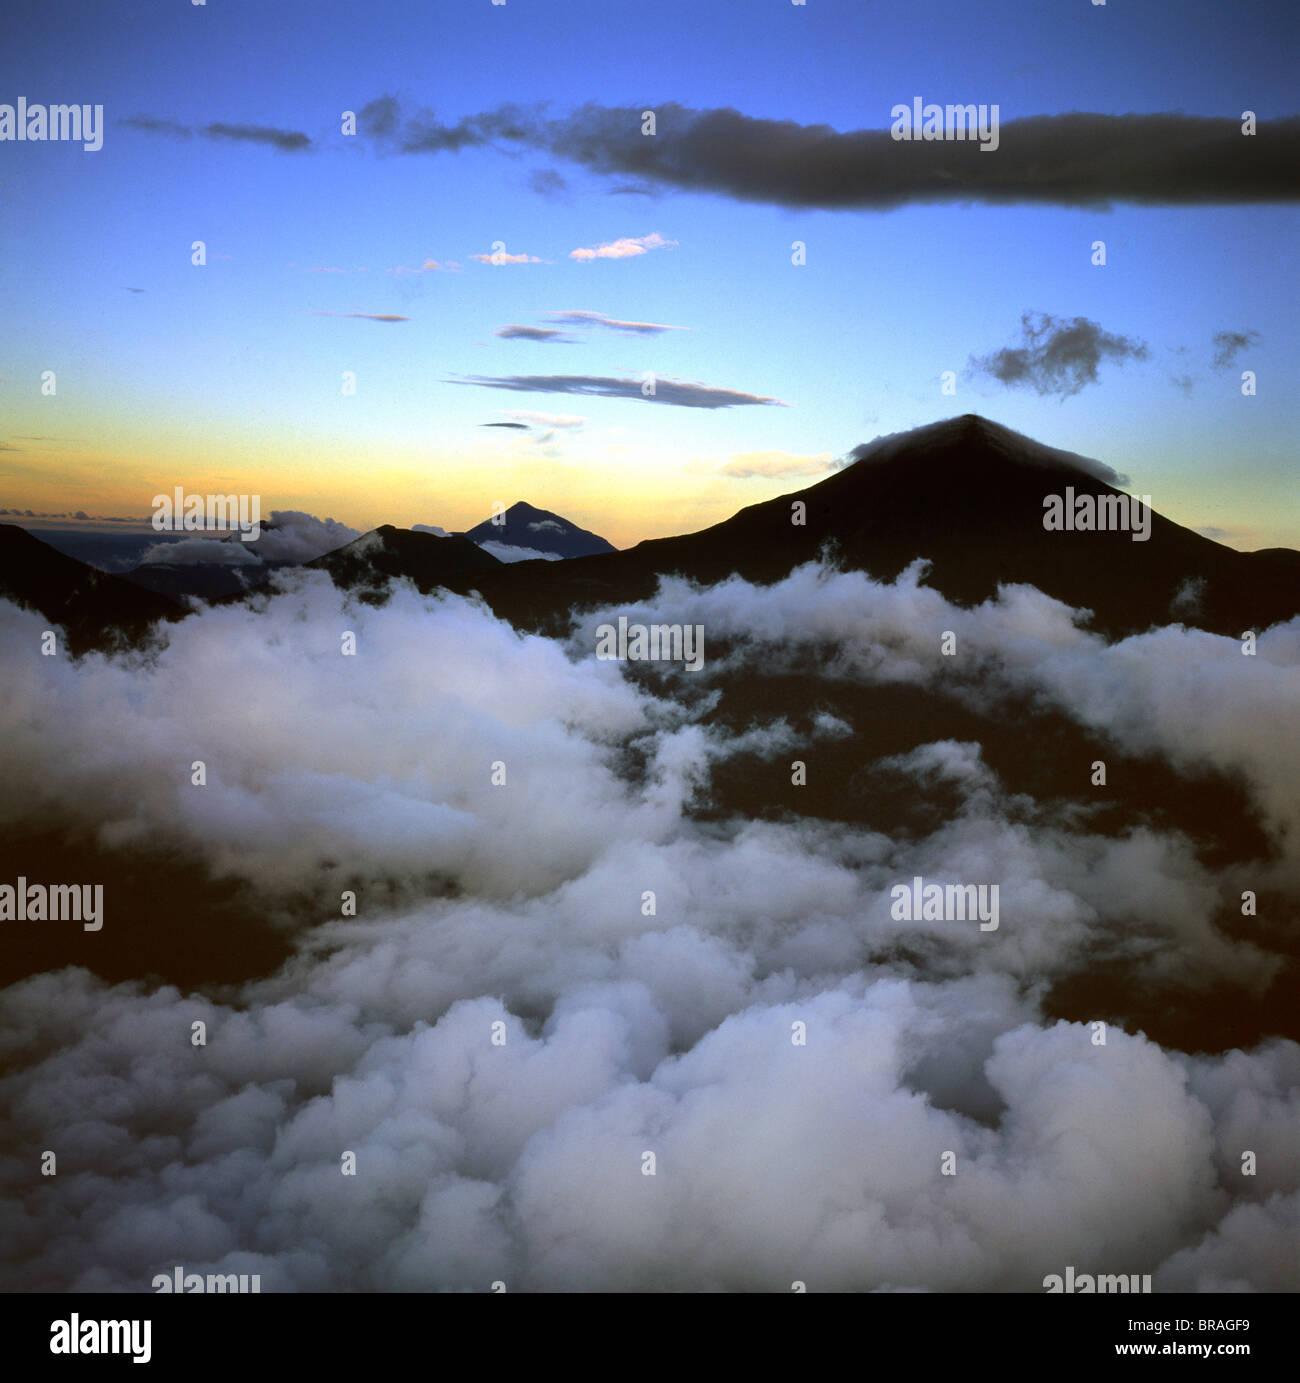 Aerial view of Mount Karisimbi, a dormant volcano in the Virunga Mountains - Stock Image